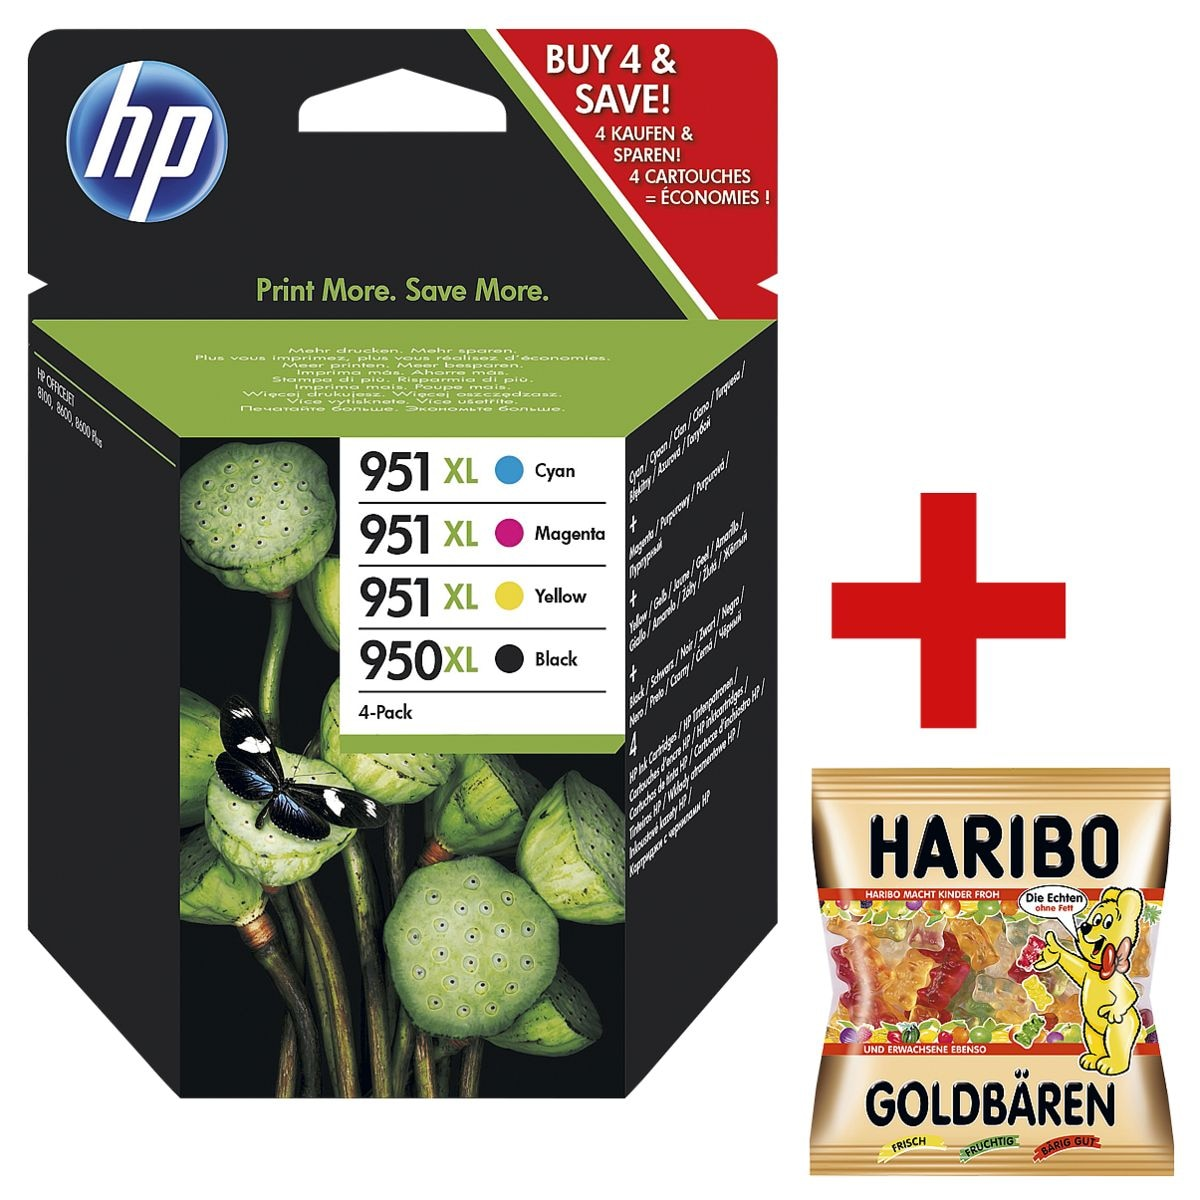 HP Tintenpatronen-Set HP 950XL + HP 951XL, schwarz, cyan, magenta, gelb - HP C2P43AE inkl. Fruchtgummi »Goldbären«